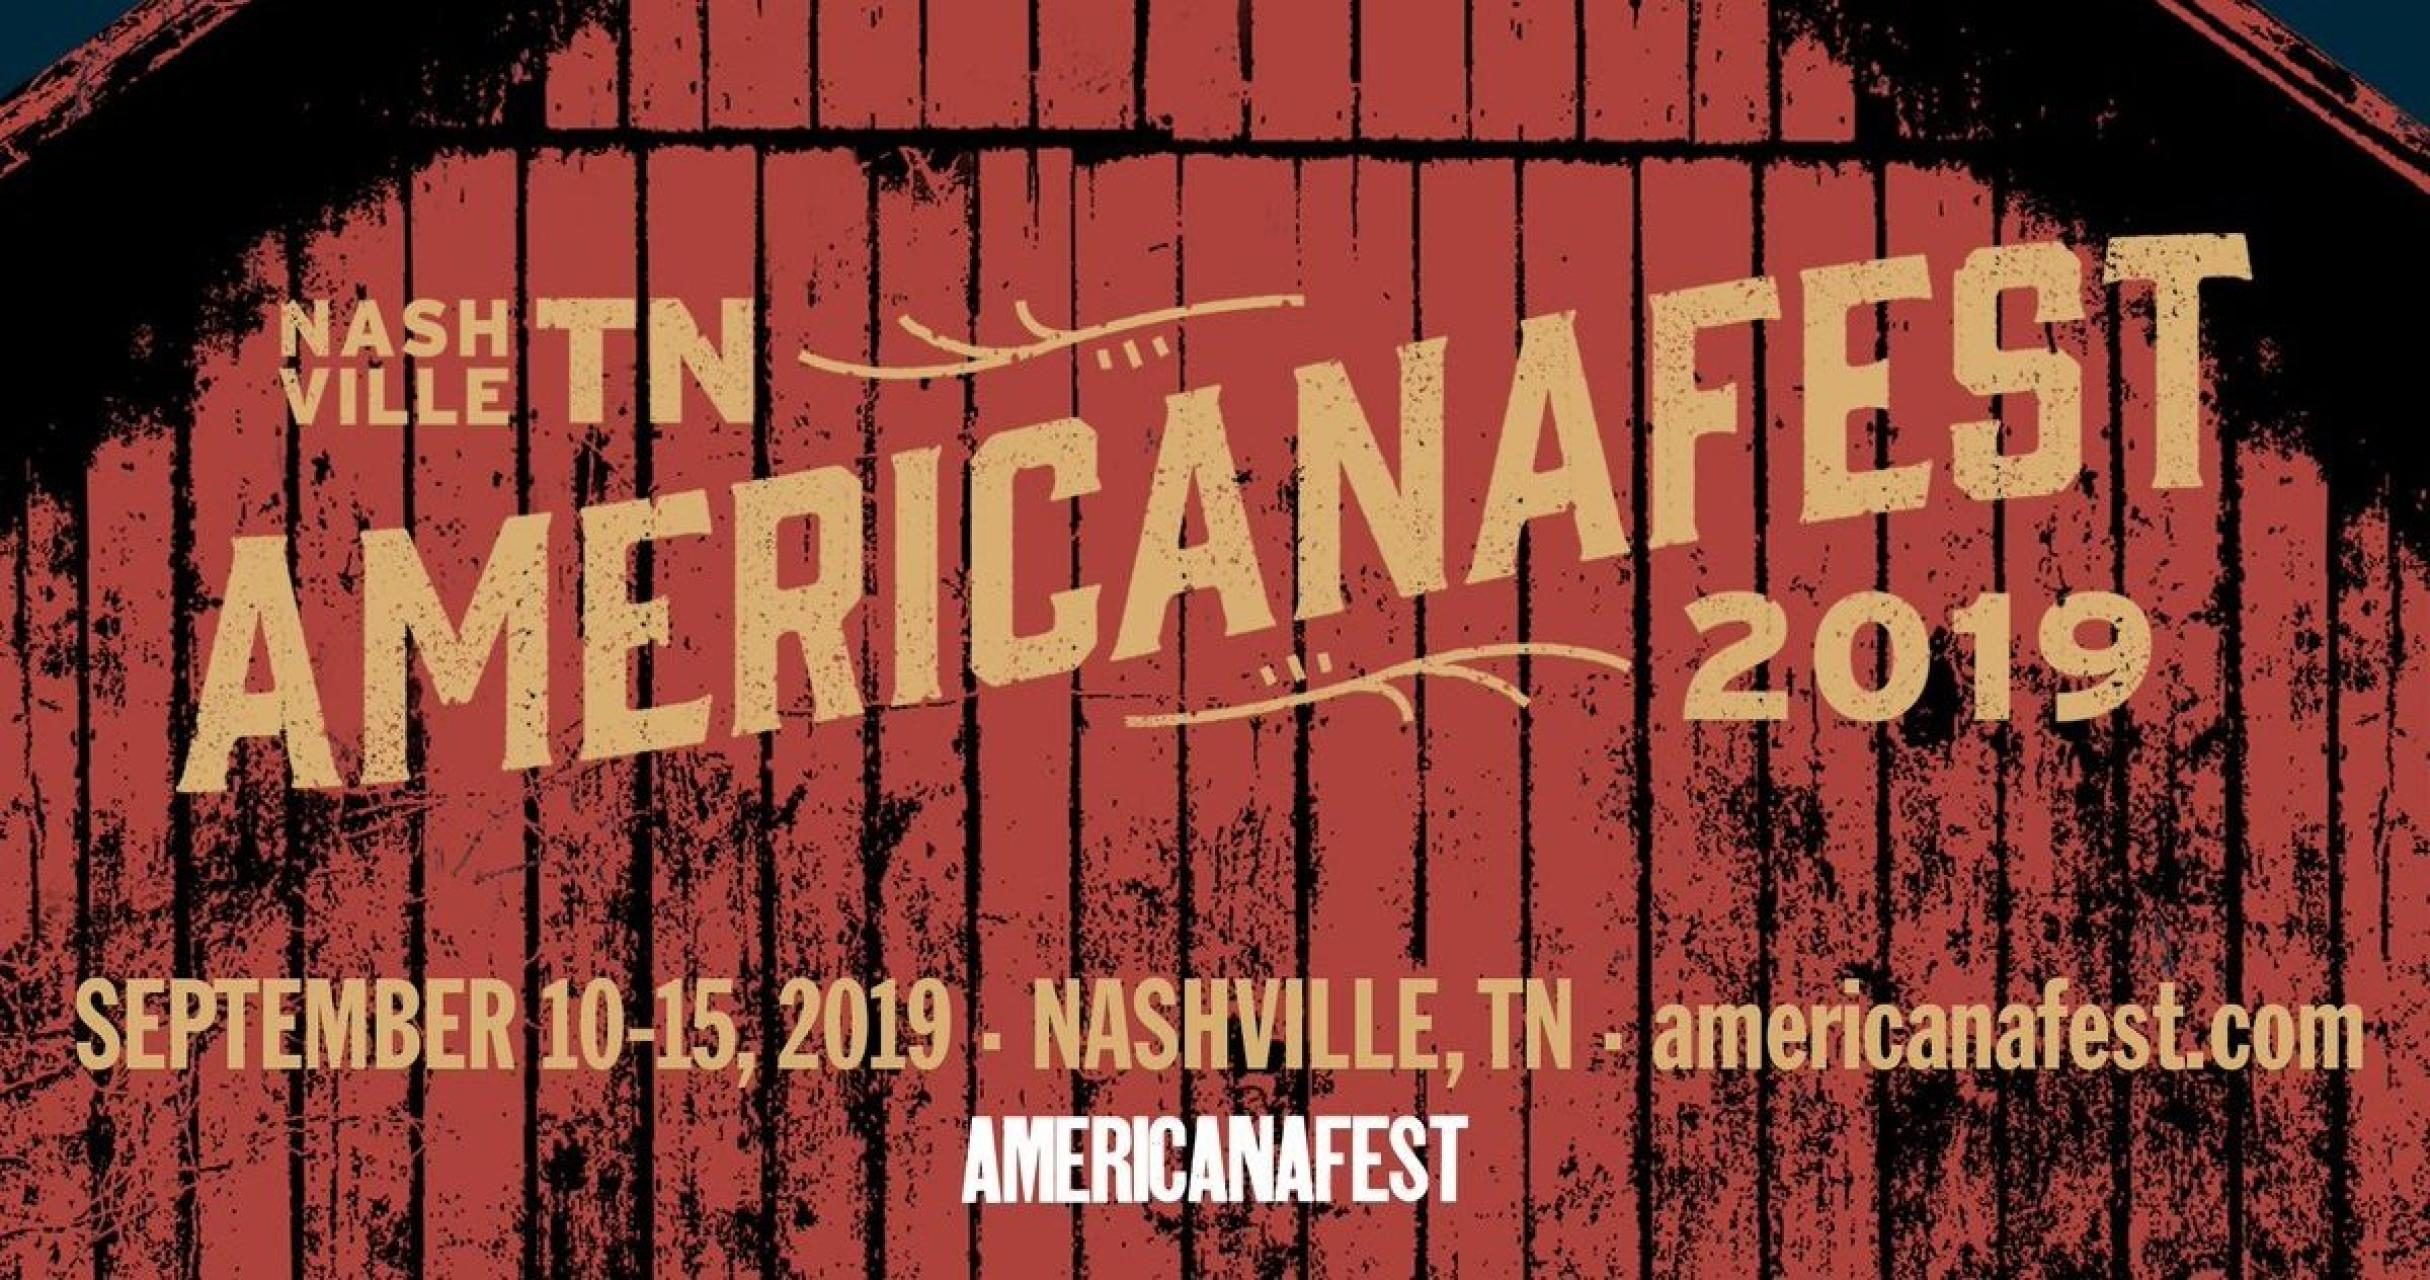 Americanafest 2019 logo